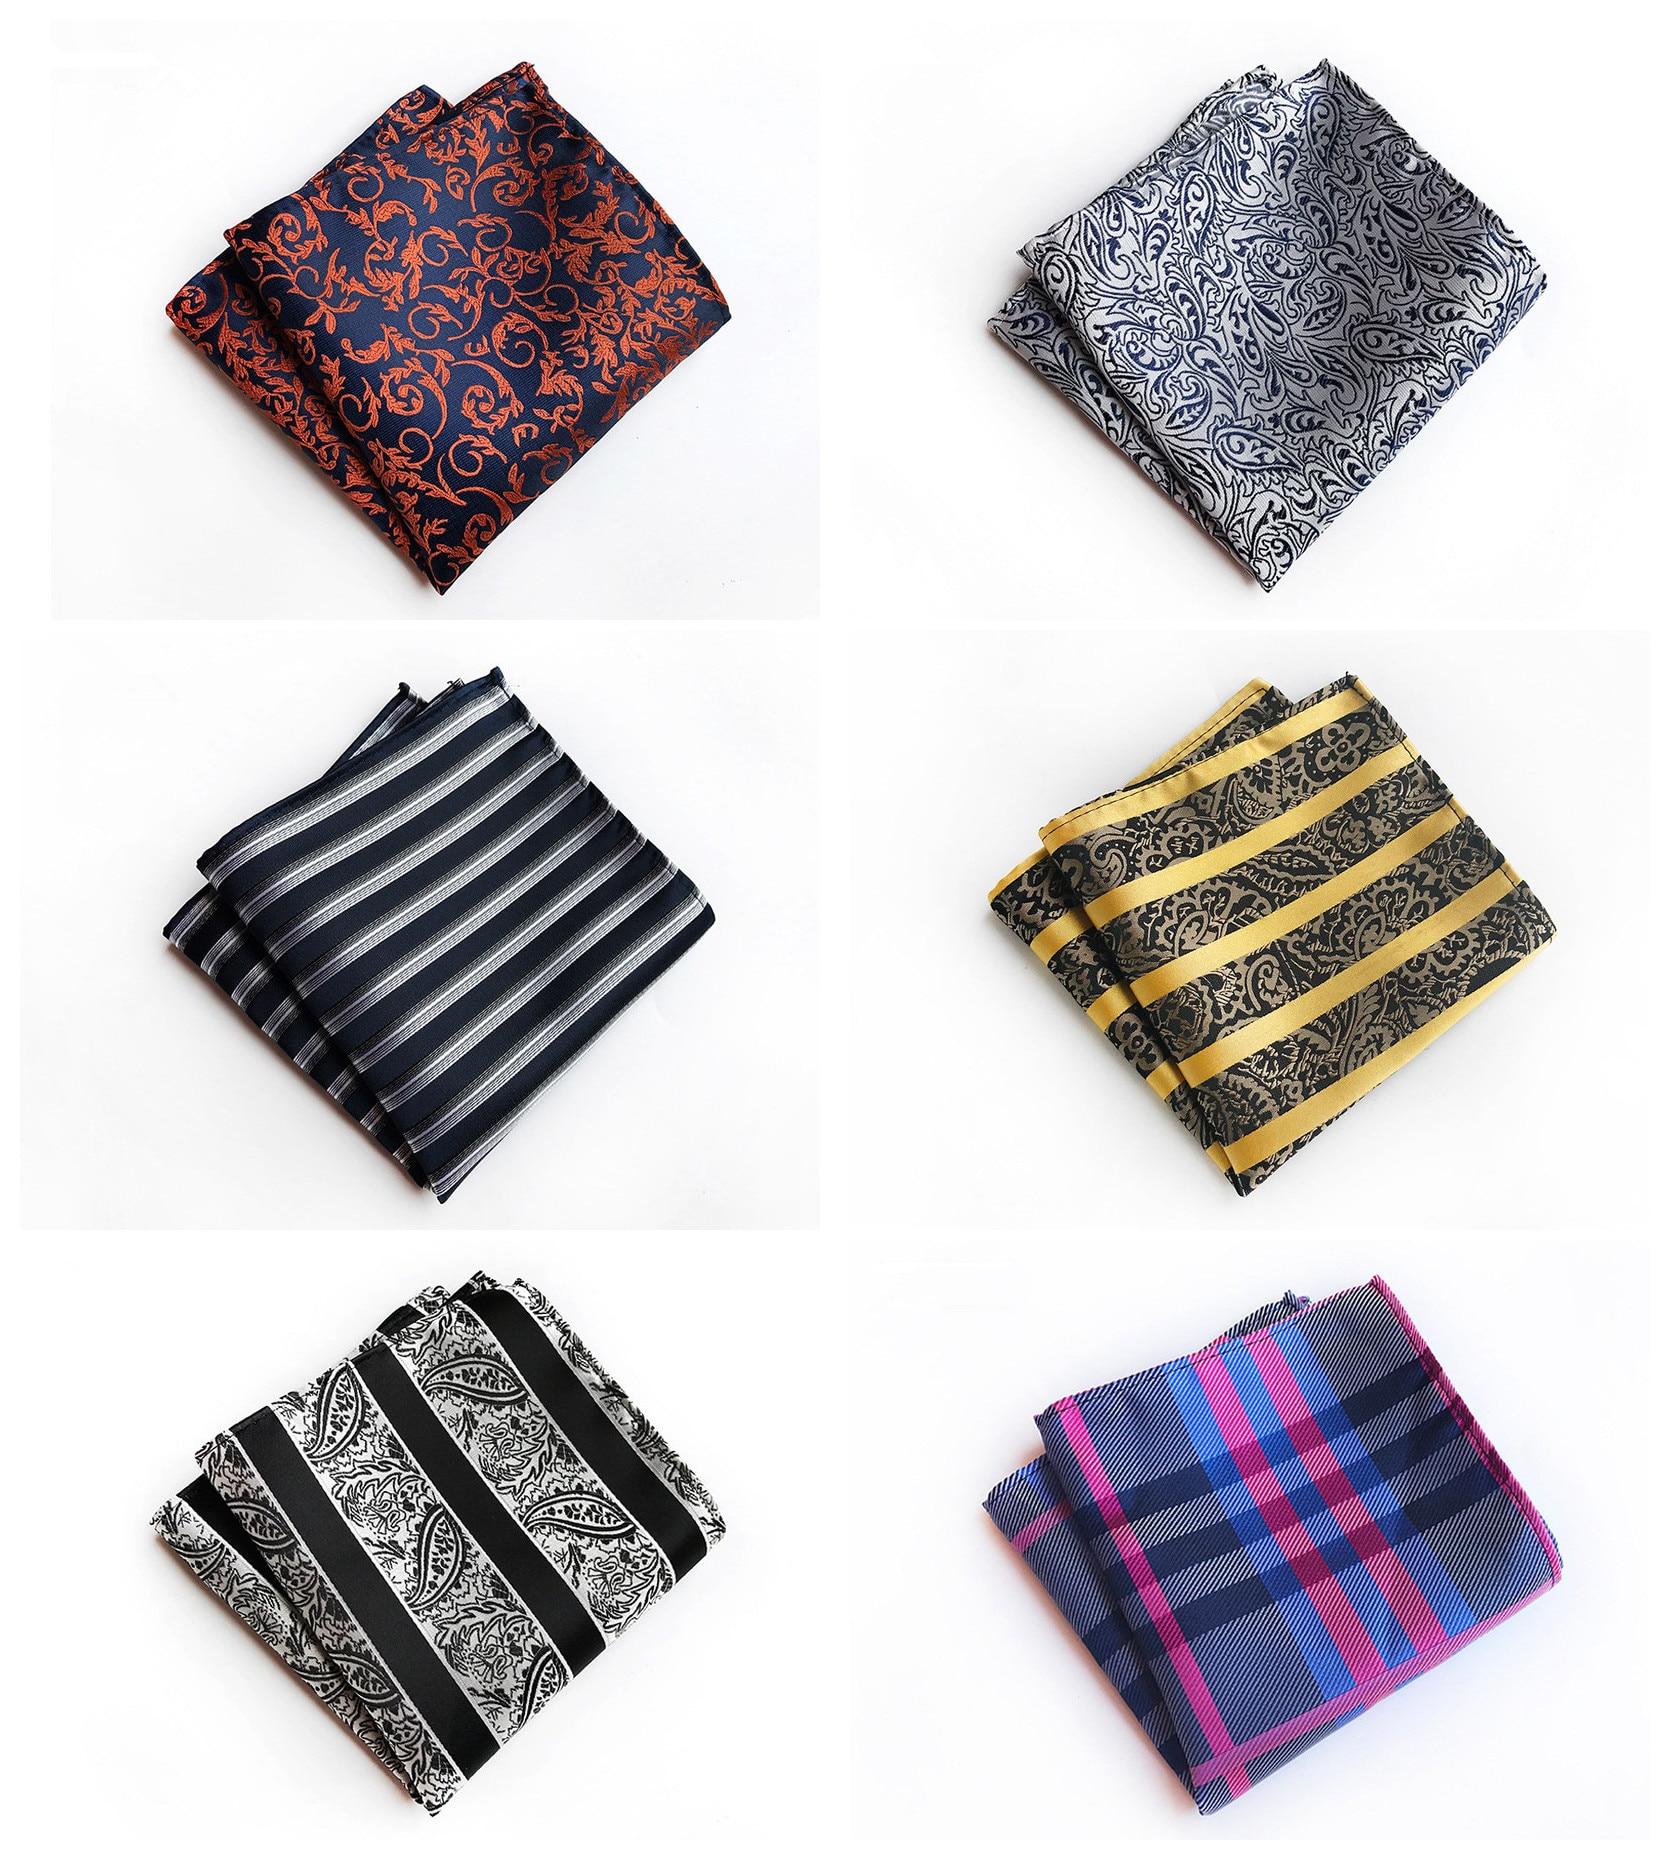 High-end Design Business Men's High Quality Decorative Handkerchief Pocket Towel Fashion Quality Polyester Paisley Pocket Towel